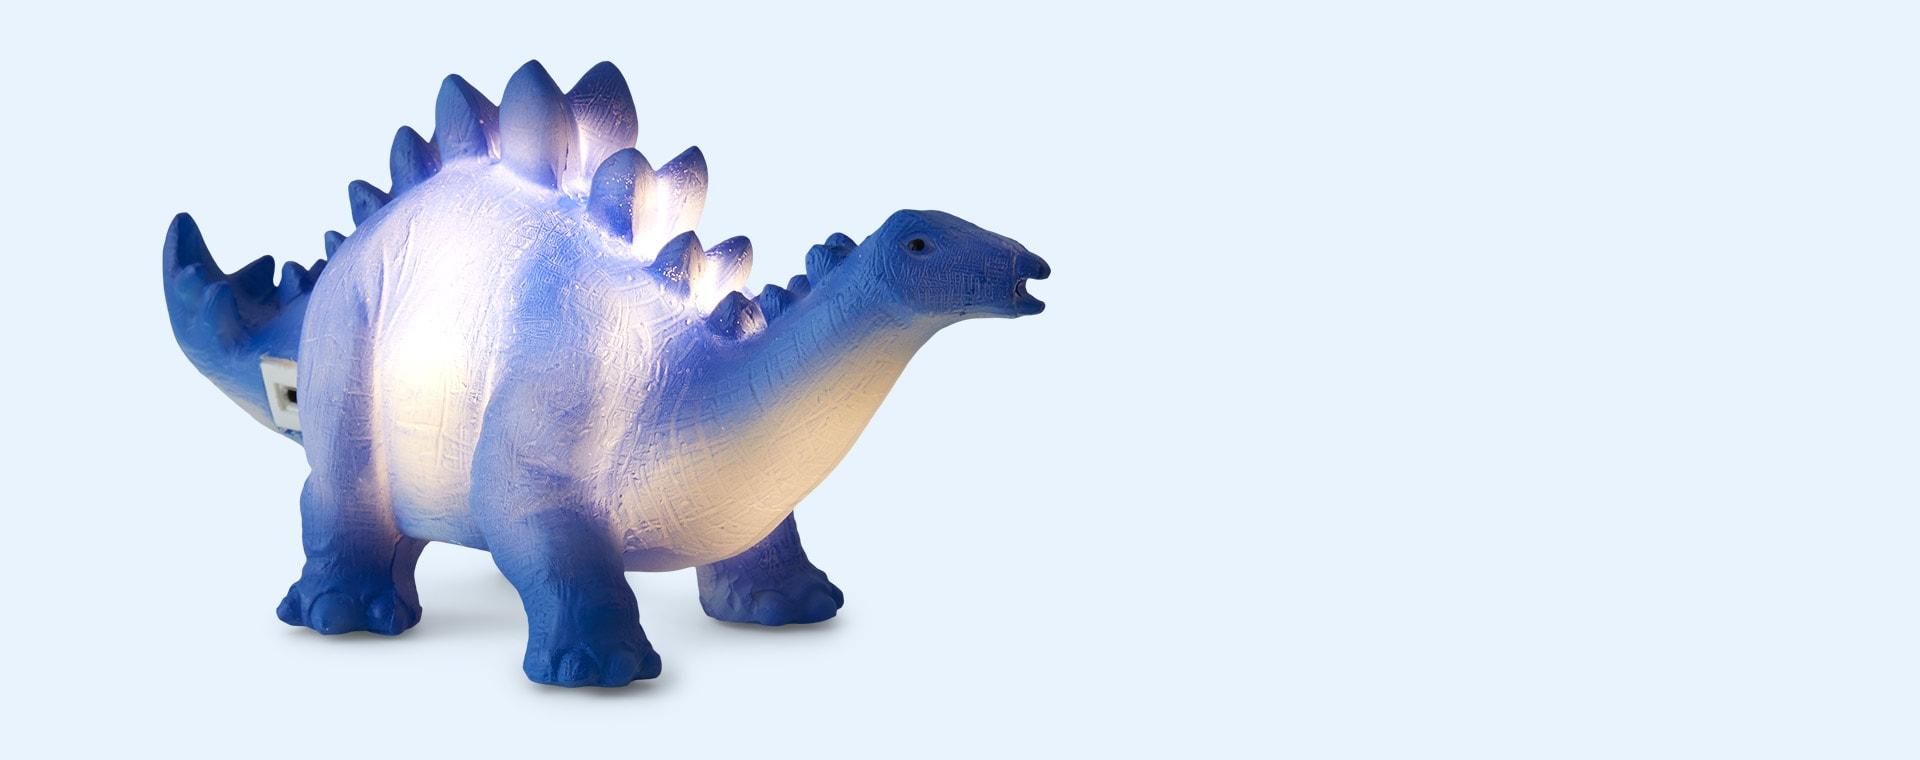 Stegosurus House of Disaster Dinosaur LED Lamp